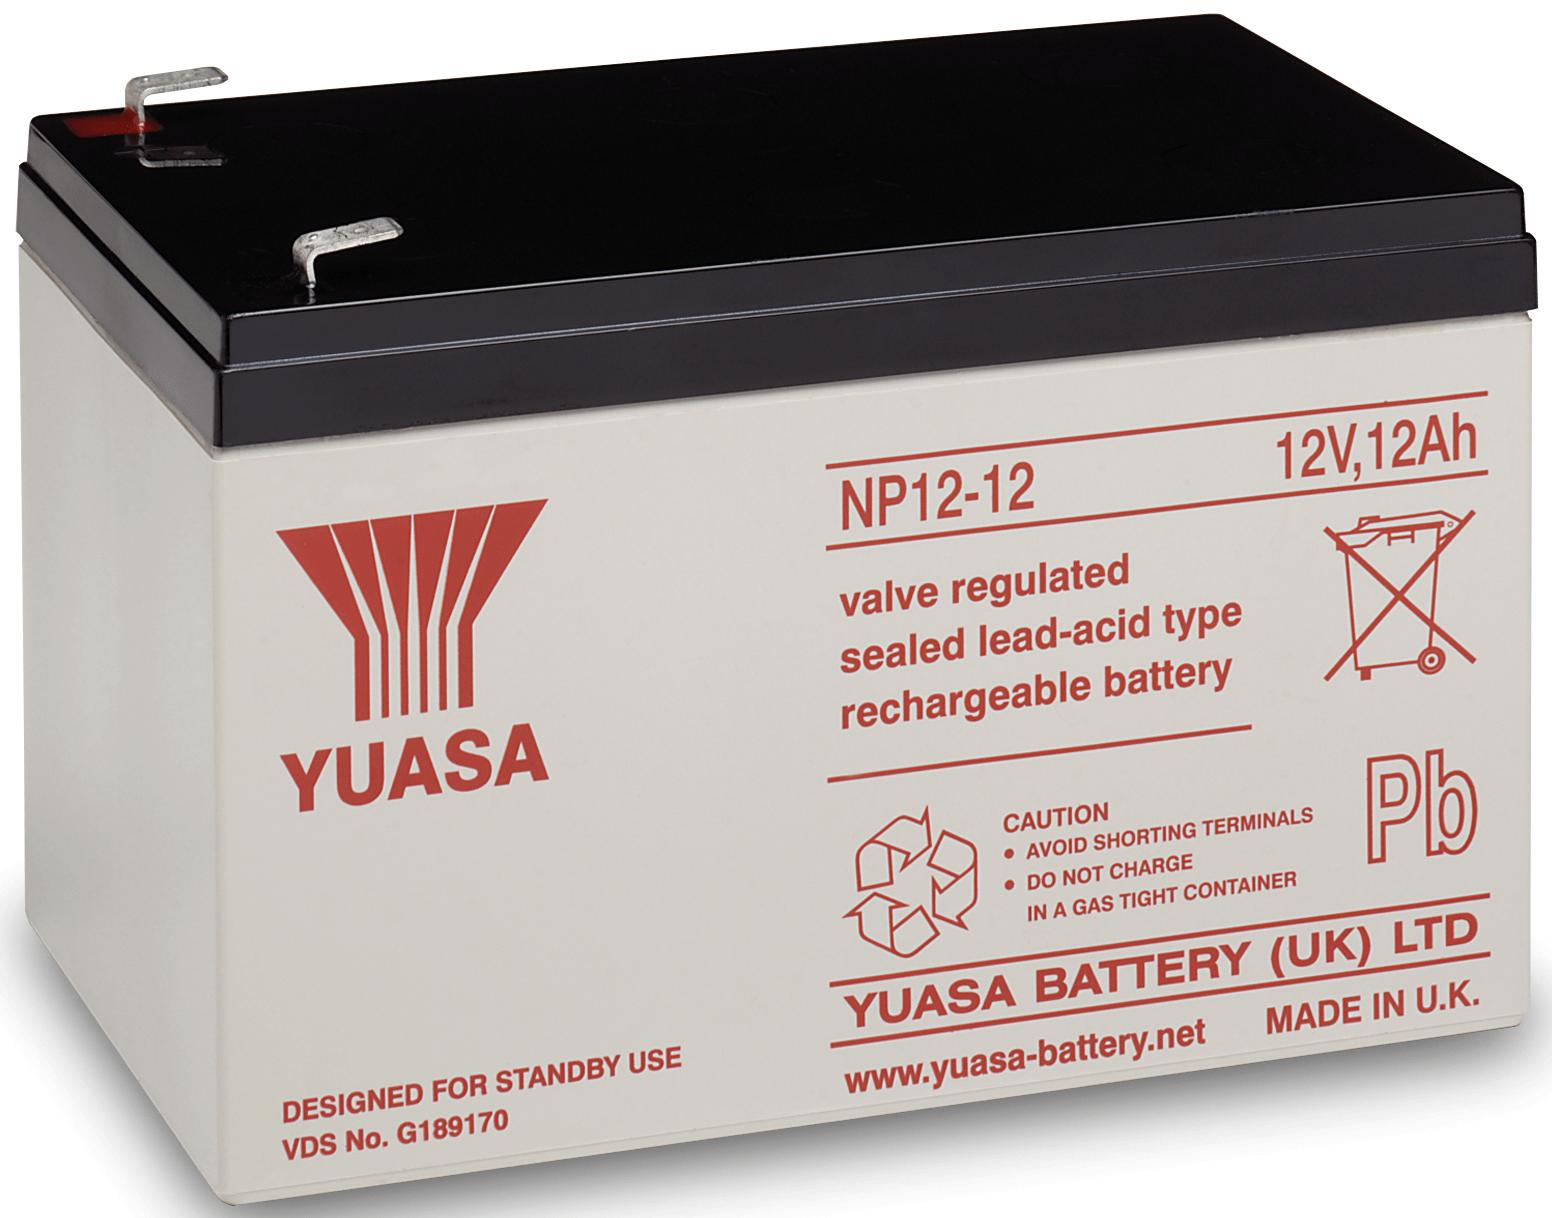 Yuasa NP12-12 NP12-12 Loodaccu 12 V 12 Ah Loodvlies (AGM) (b x h x d) 151 x 98 x 98 mm Kabelschoen 6.35 mm Onderhoudsvrij, VDS-certificering